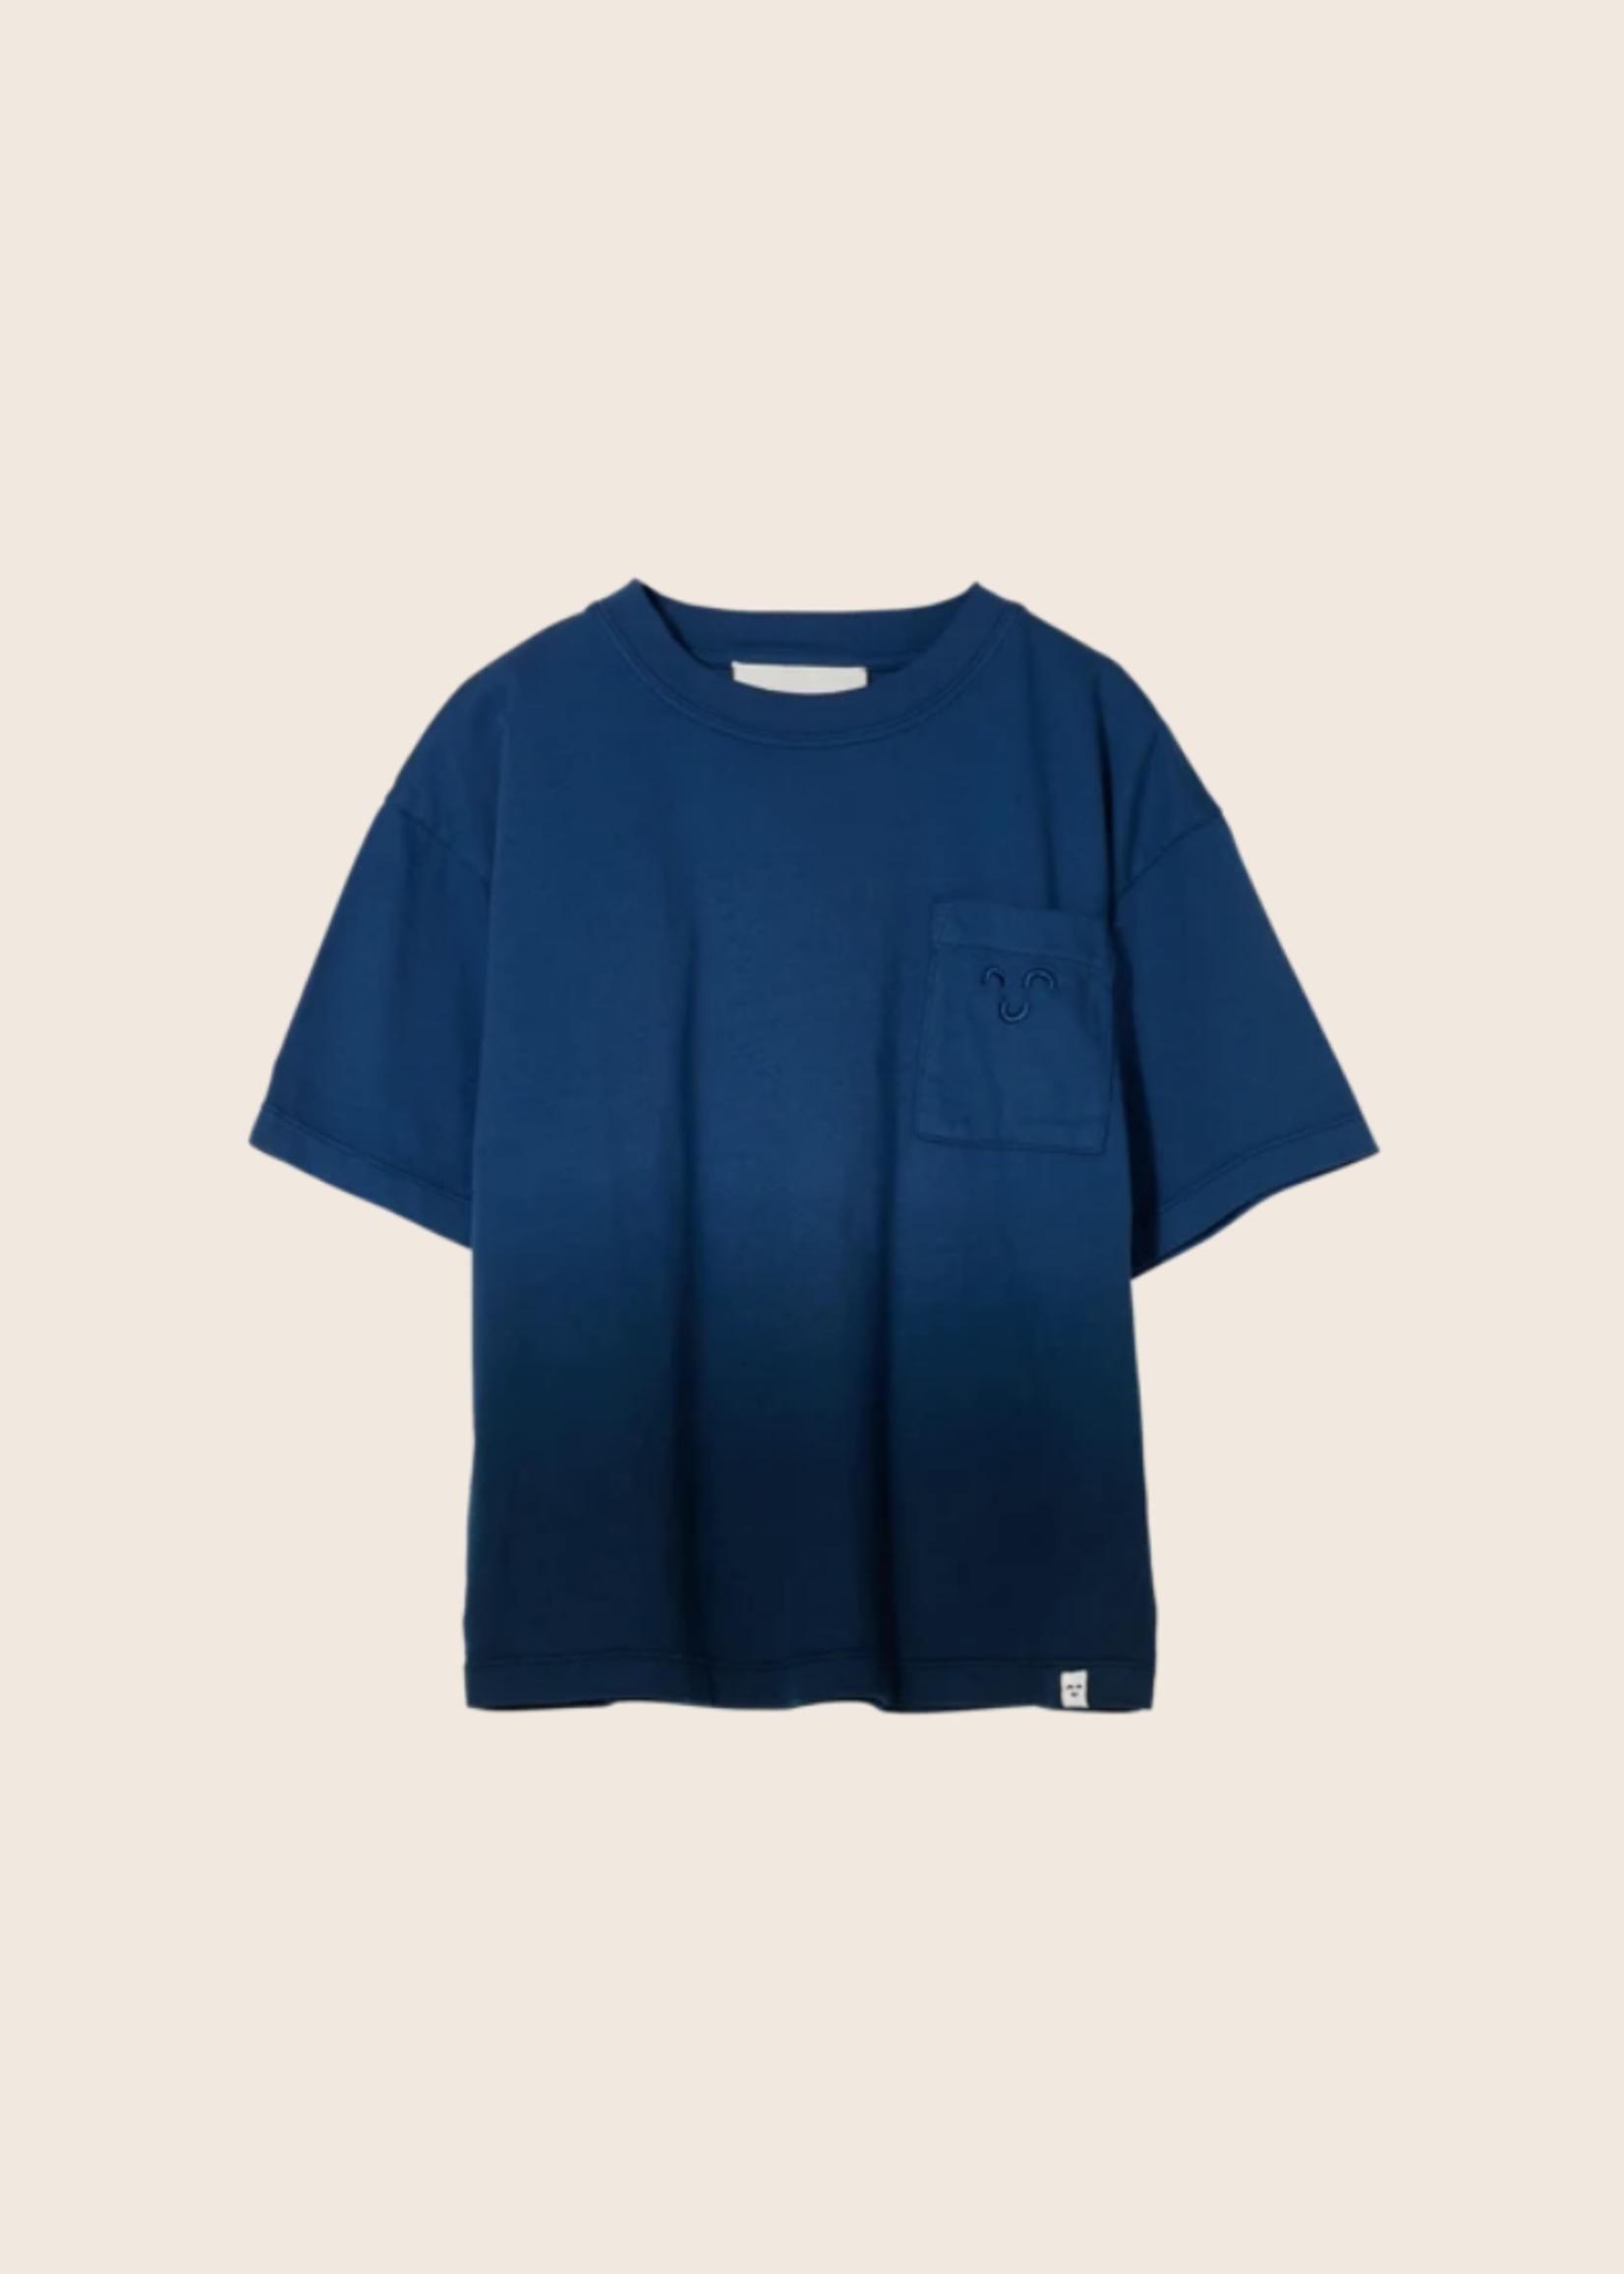 FINGER IN THE NOSE KING Work Blue Dip Dye - Short Sleeves T Shirt Boy / Knitted